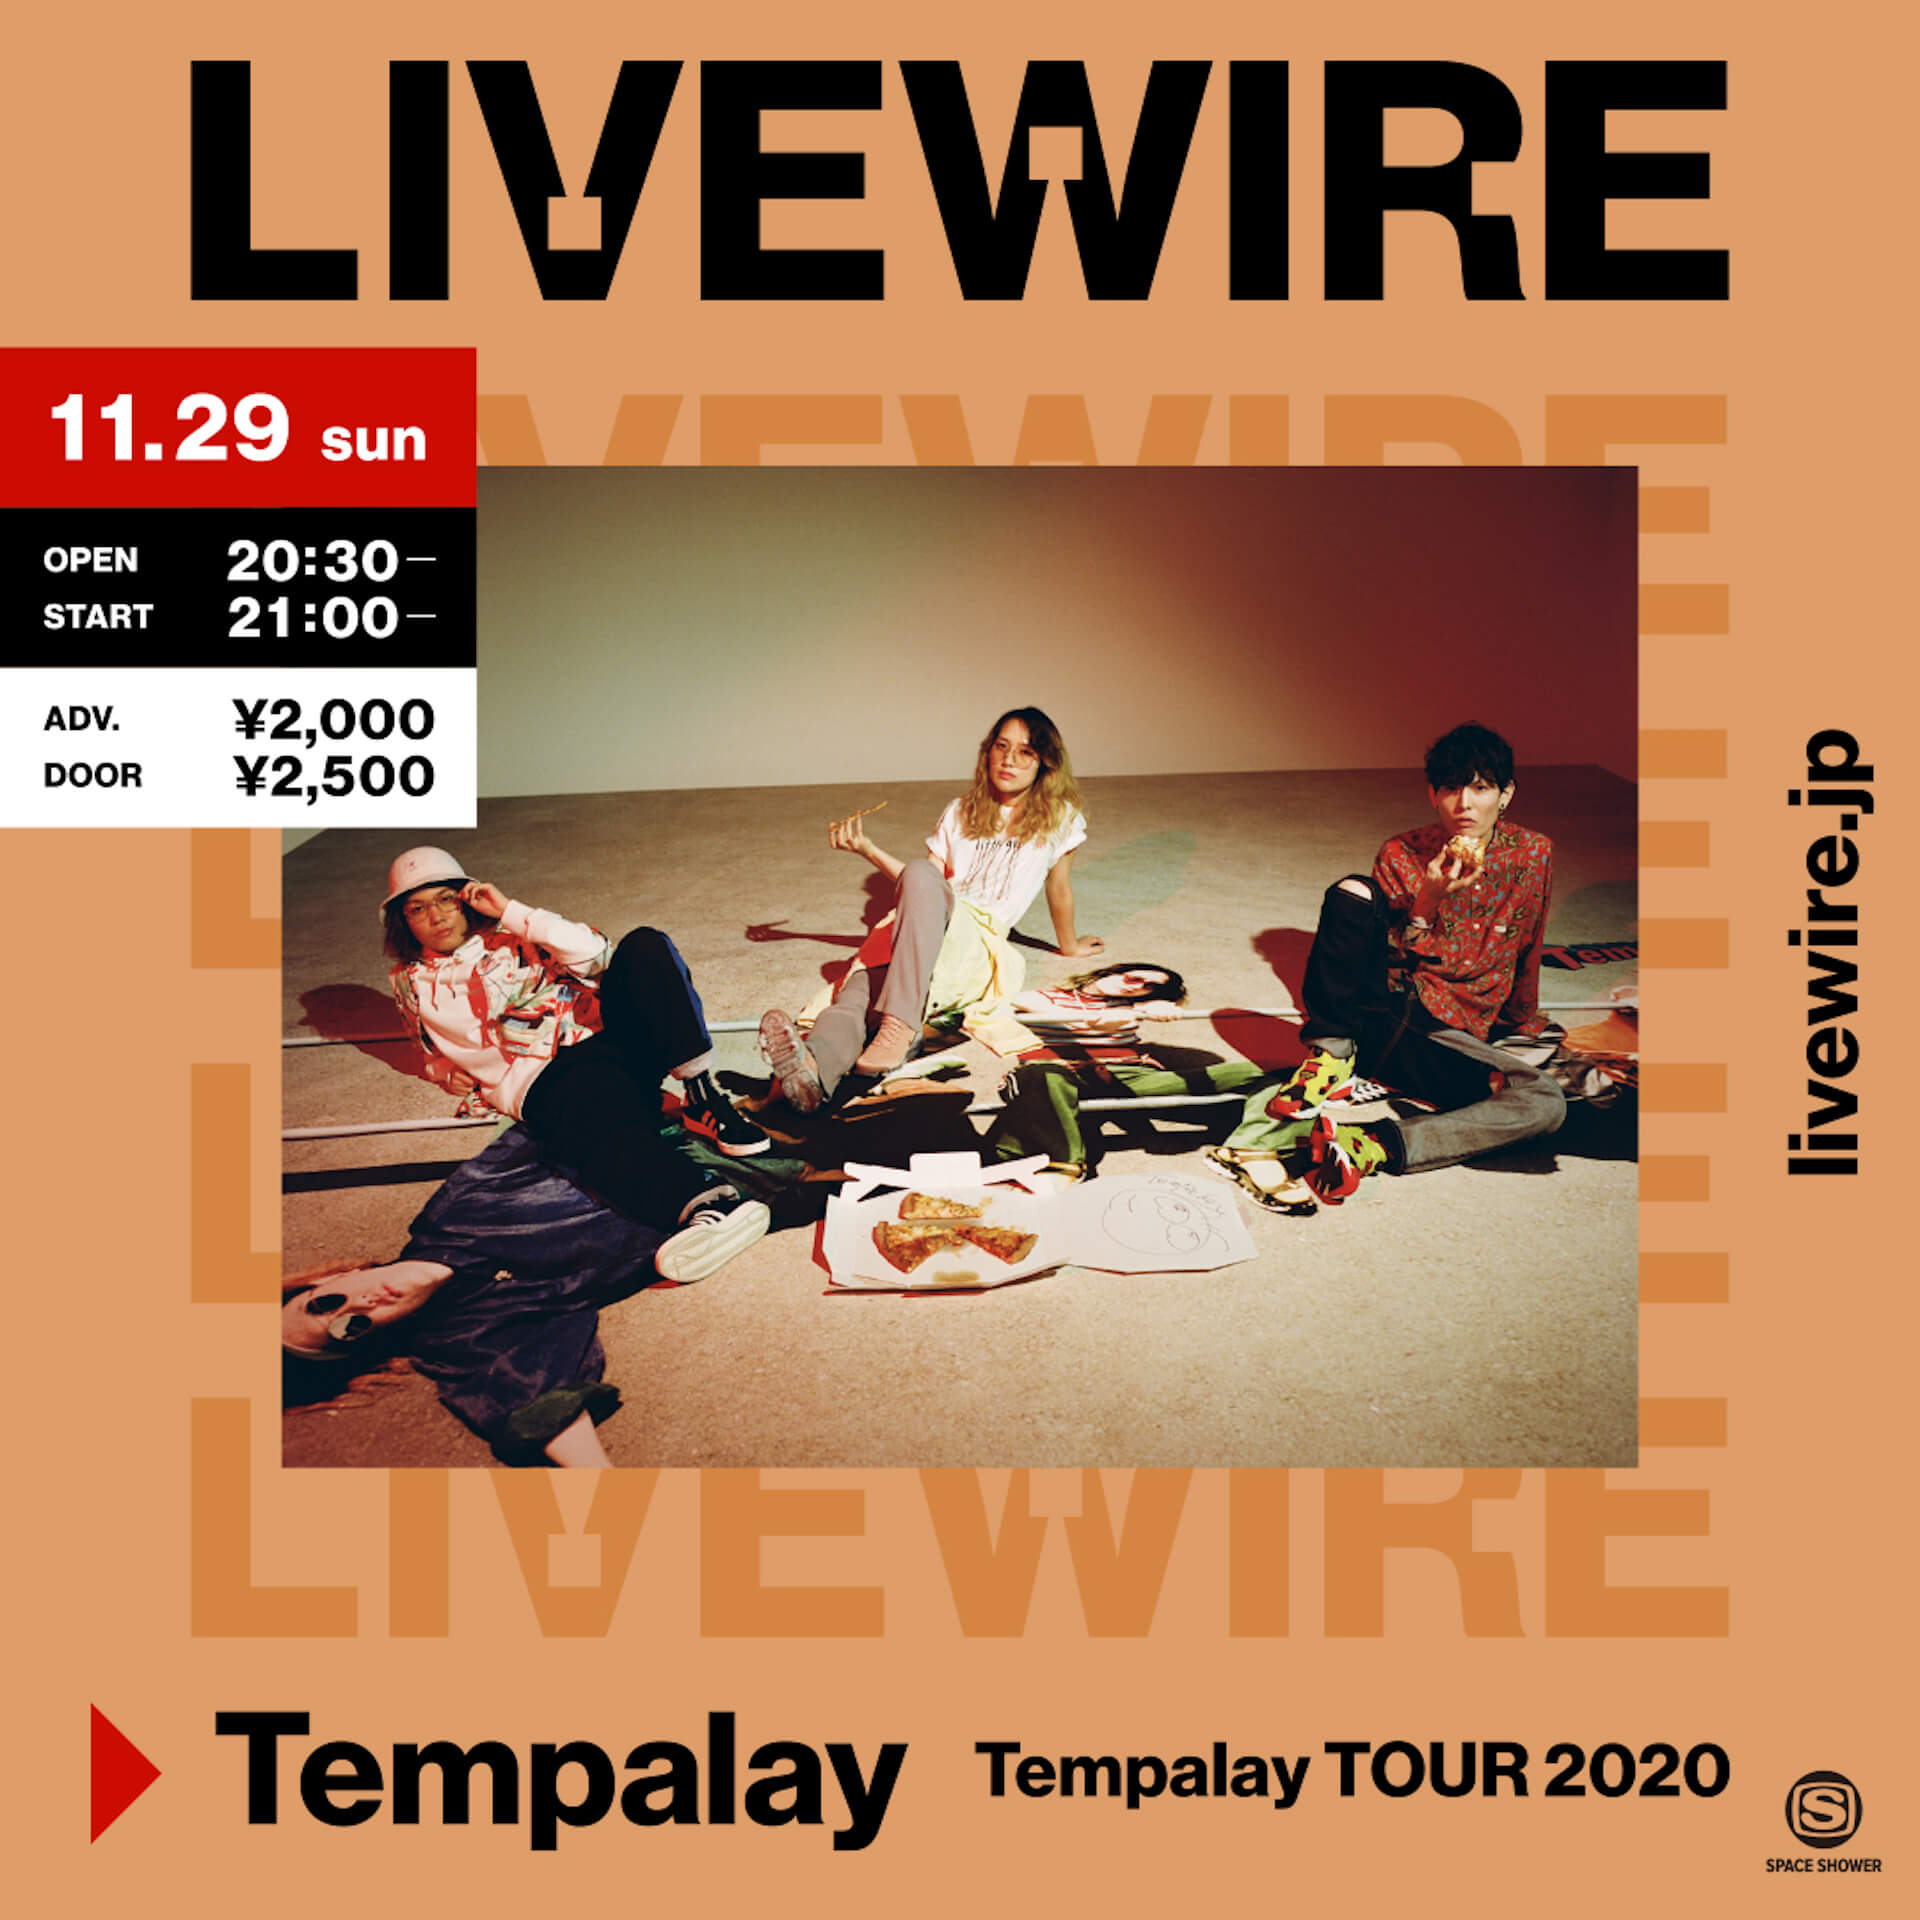 Tempalayワンマンツアー<TOUR 2020>ファイナル公演が<LIVE WIRE>にて生配信決定!舞台演出&映像配信を担当するのはMargt music20201116_tempalay_1